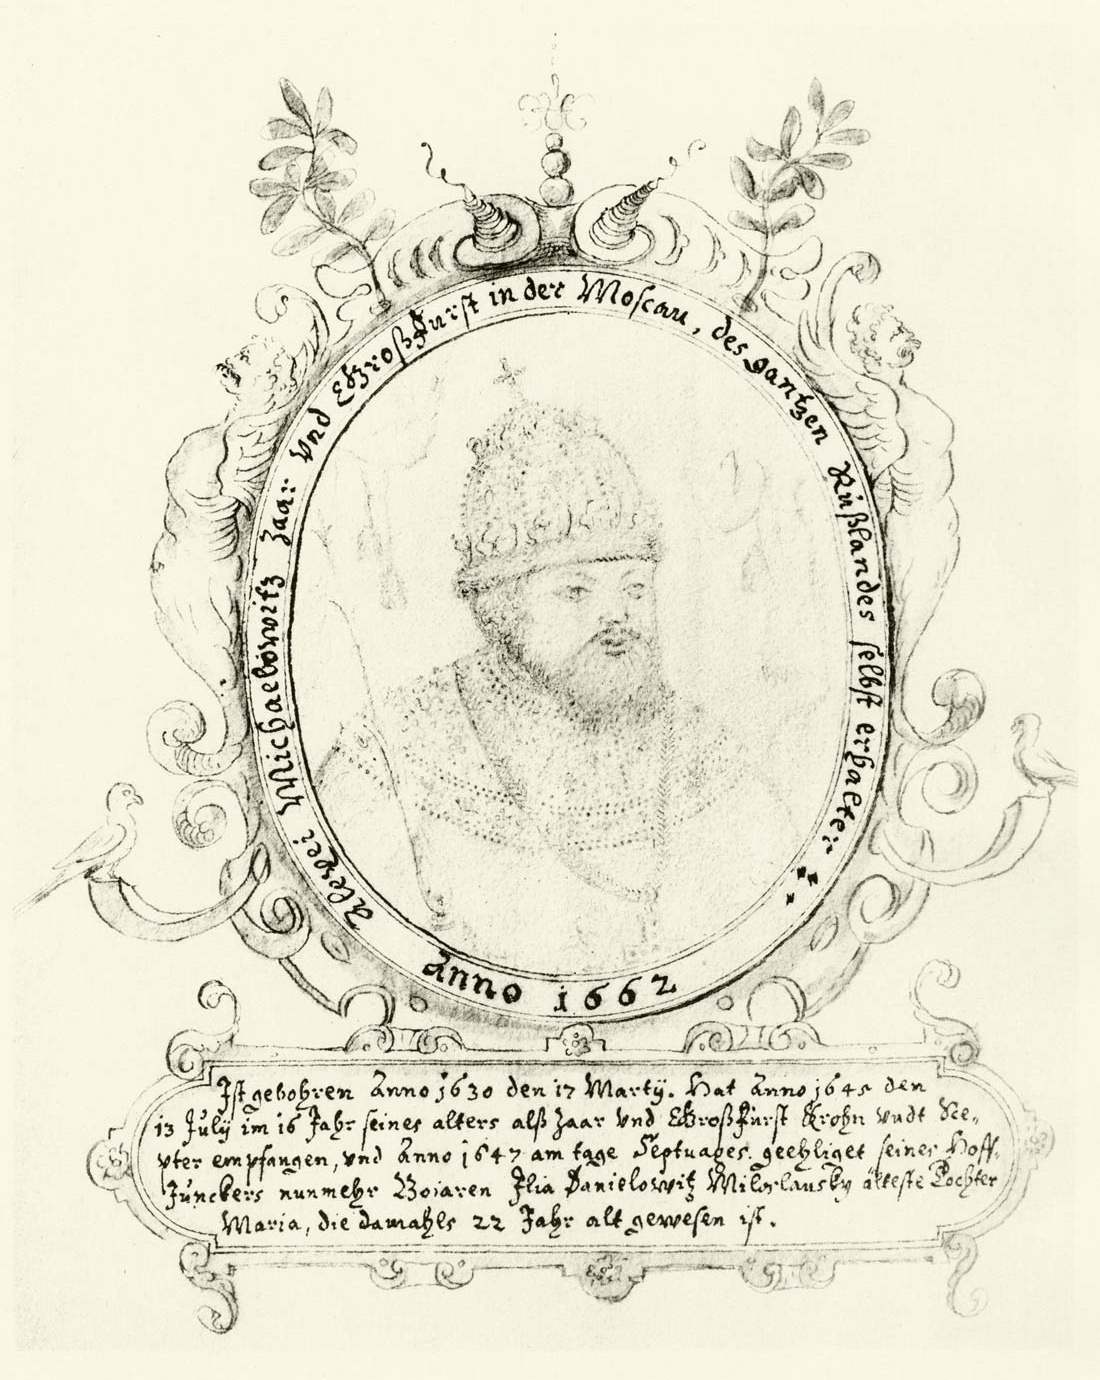 210. Портрет царя Алексея Михайловича